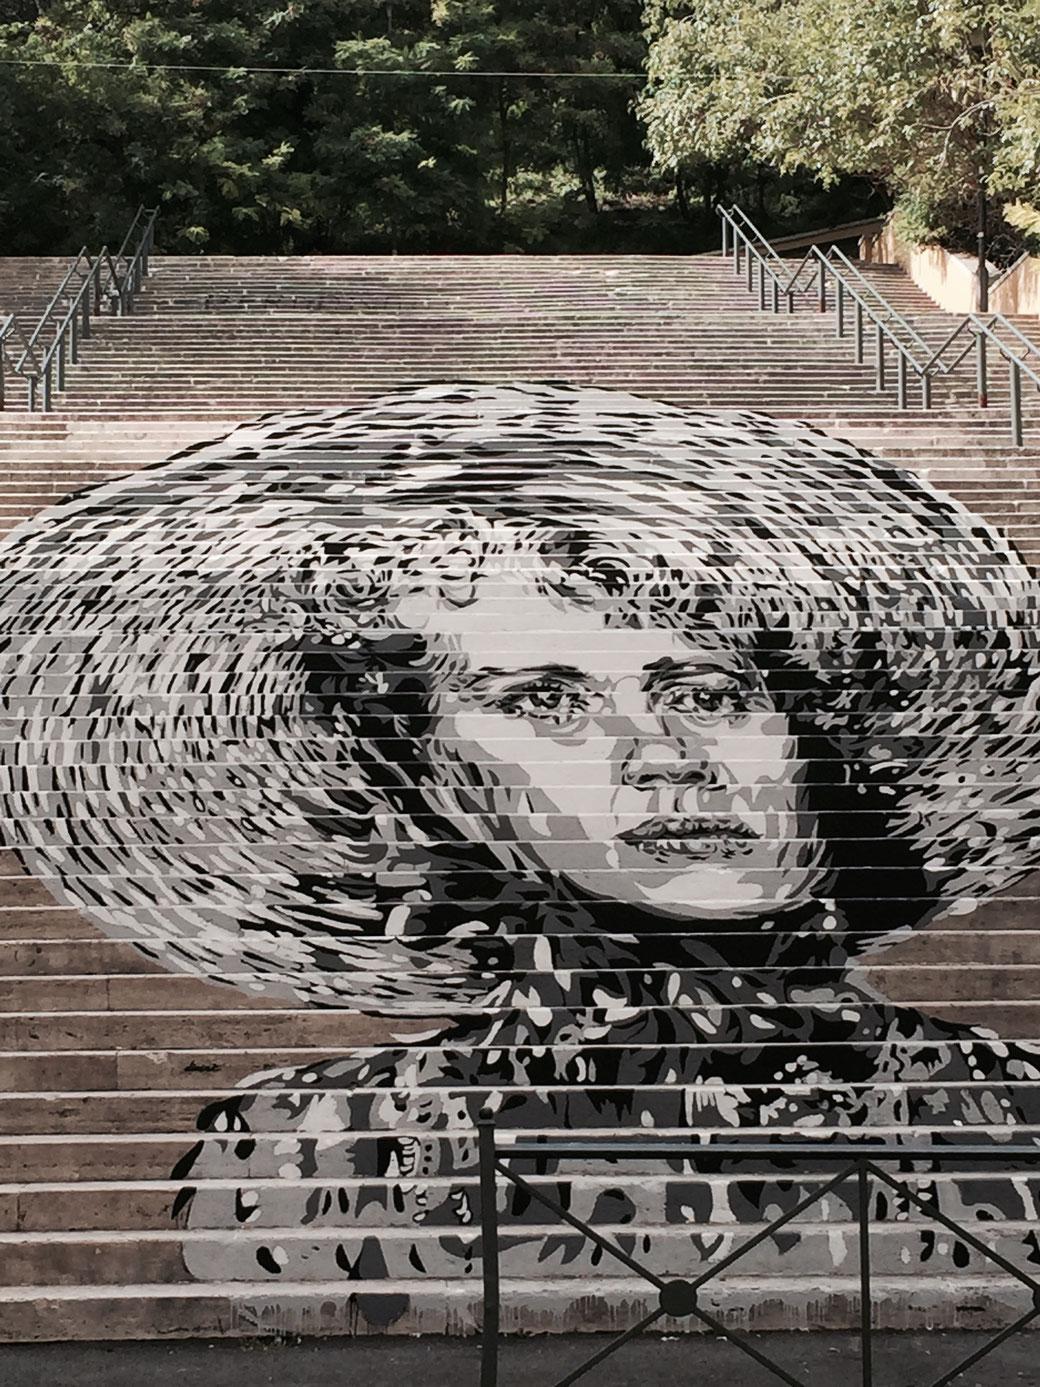 Zeitgenössische Treppenkunst in Trastevere